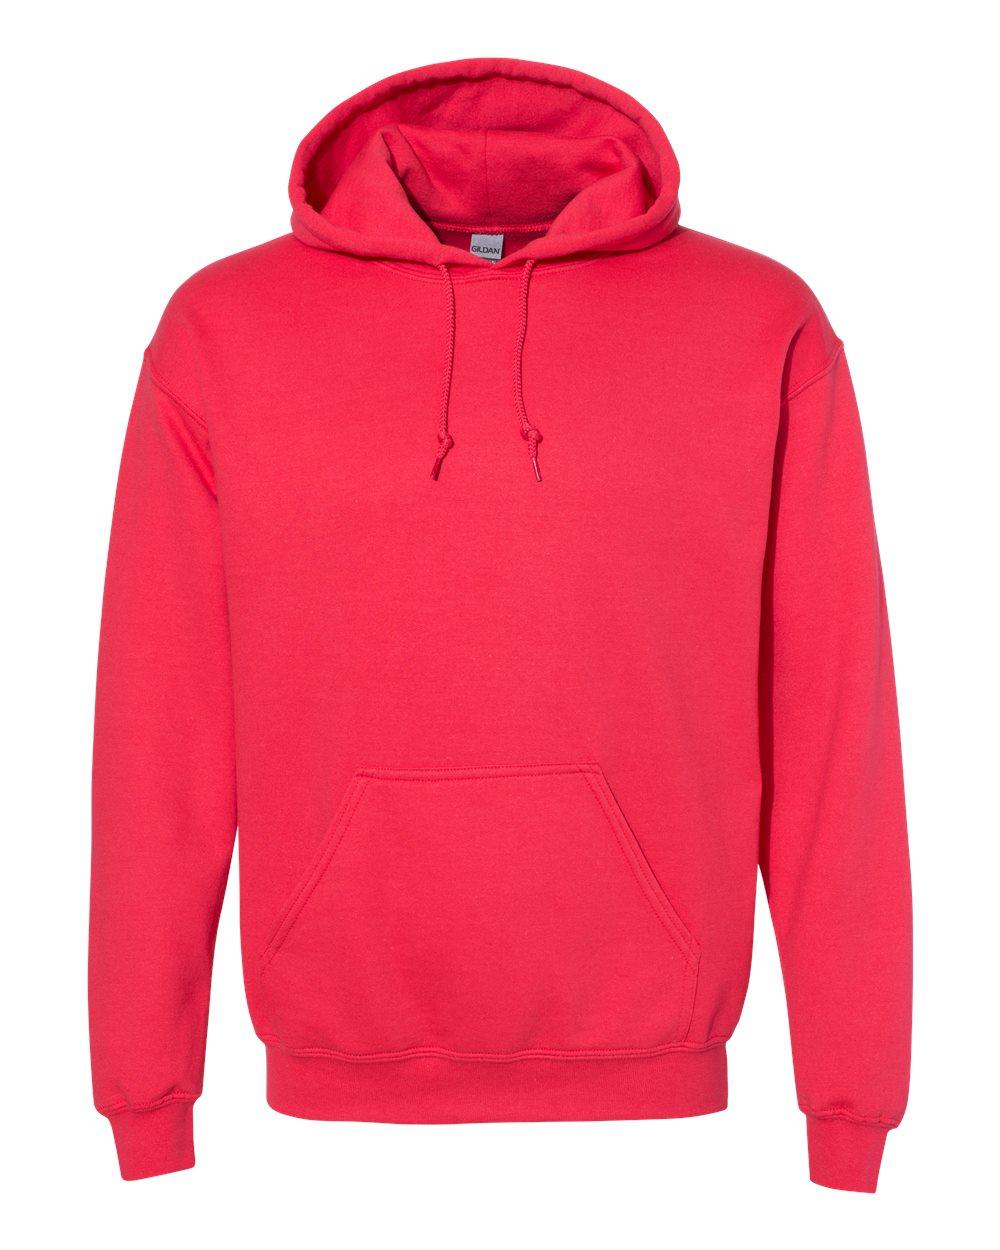 Gildan-Mens-Blank-Hoodie-Heavy-Blend-Hooded-Sweatshirt-18500-up-to-5XL thumbnail 42